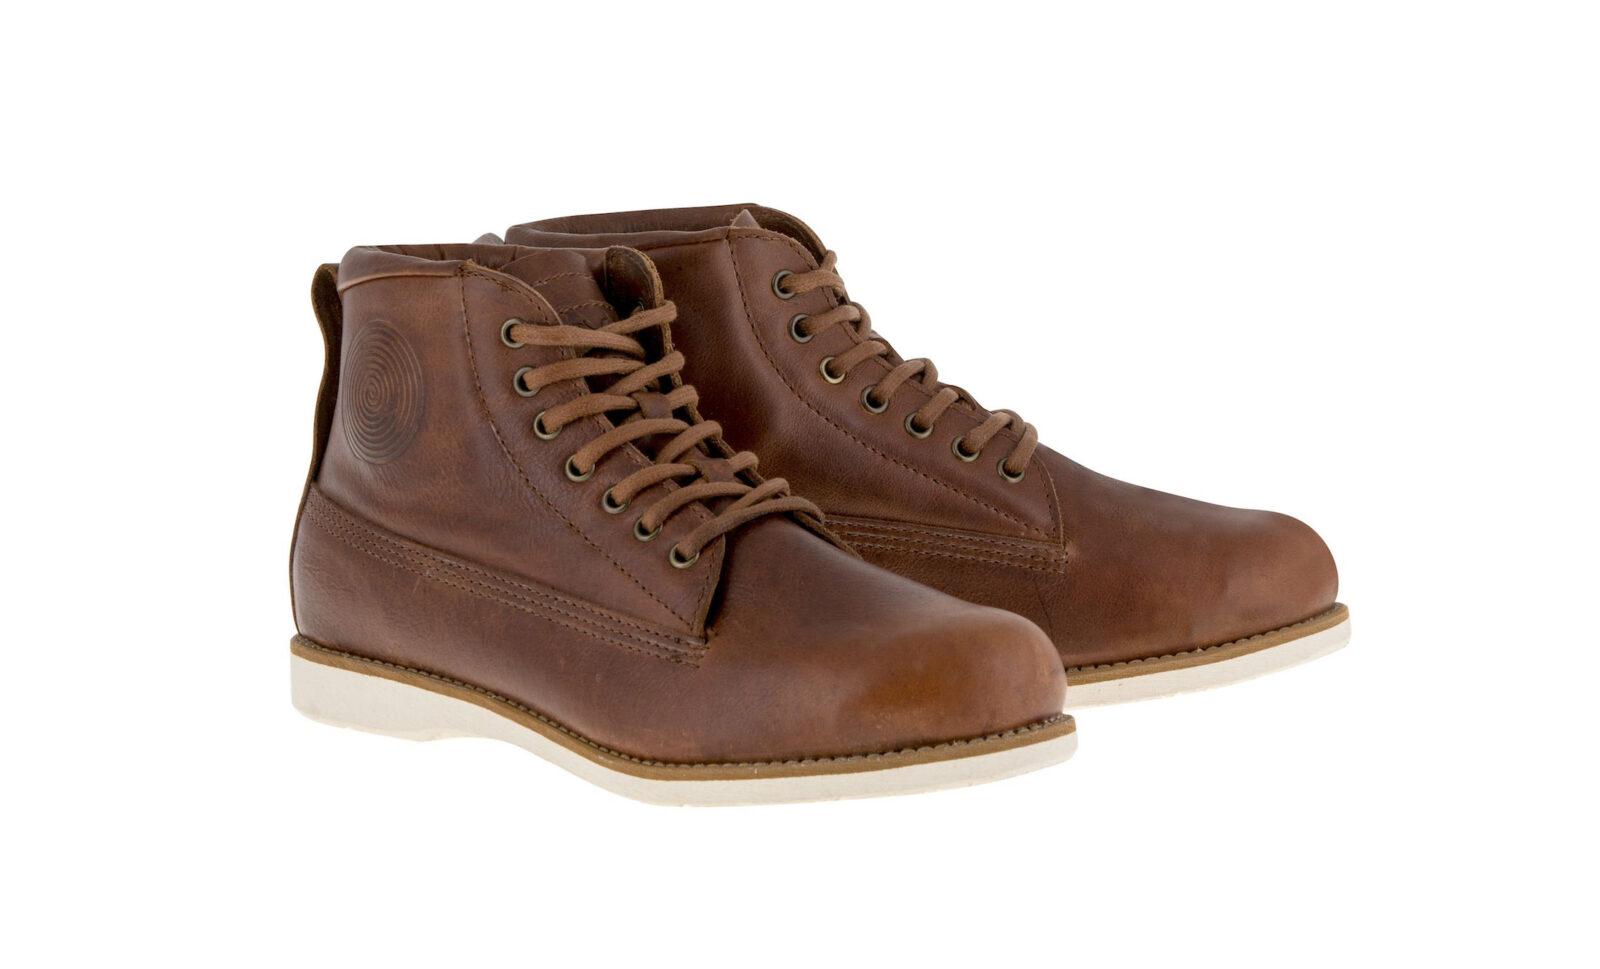 Alpinestars Oscar Rayburn Boots